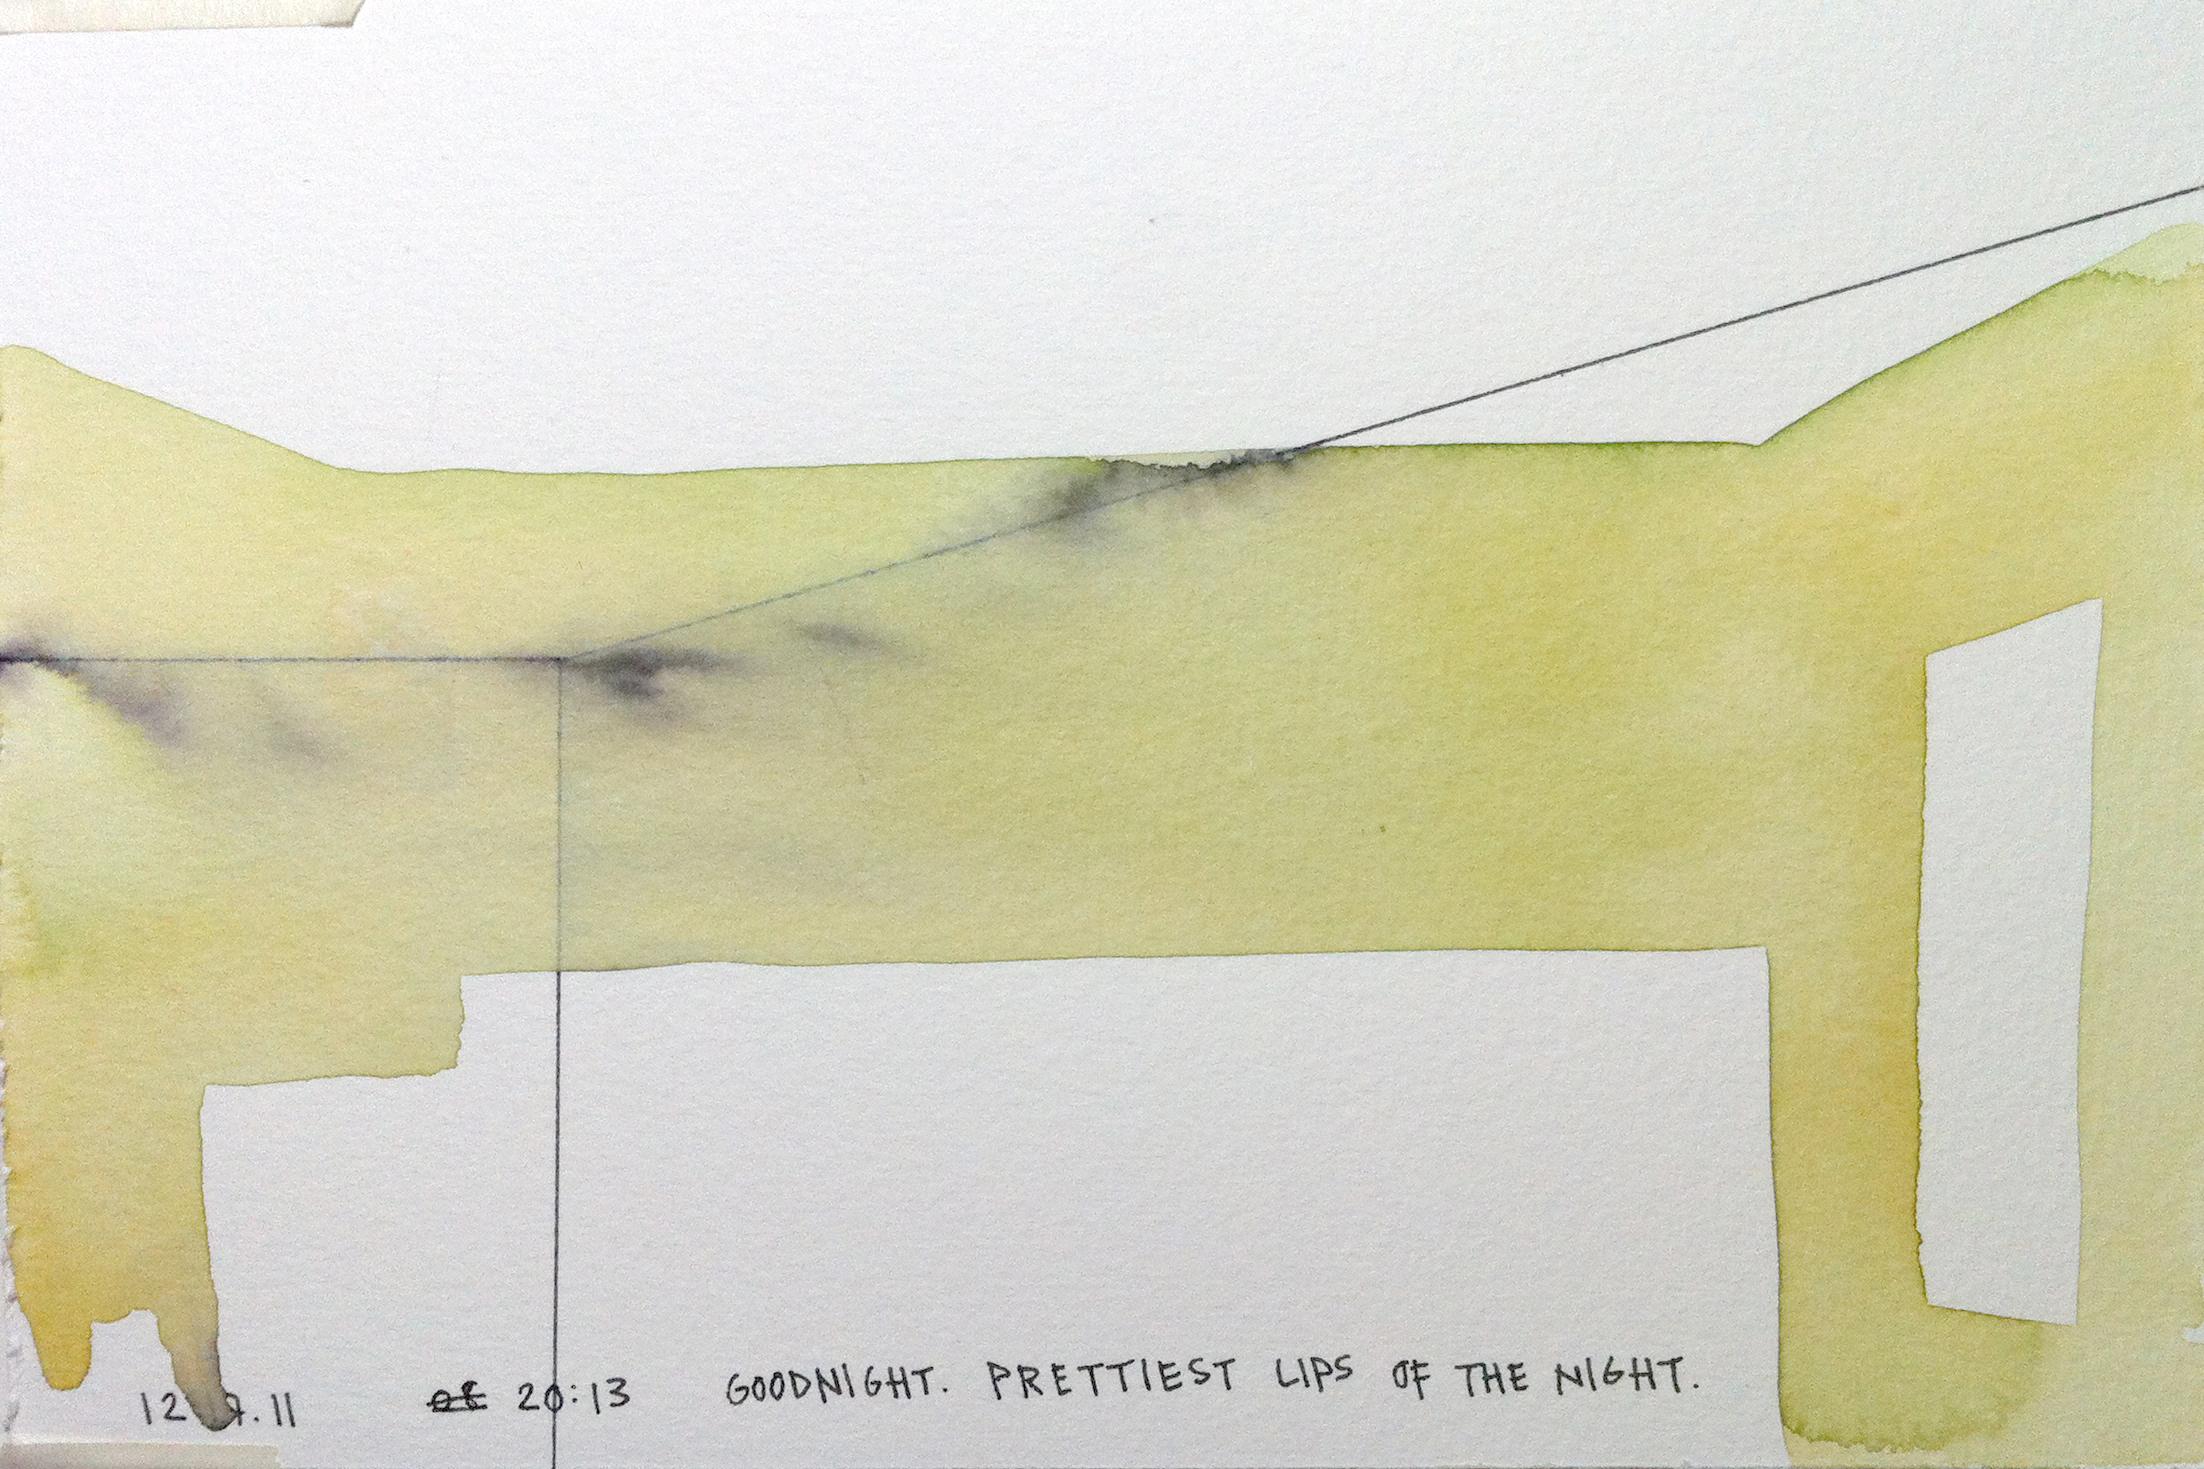 2011-11-25 drawing08.jpg